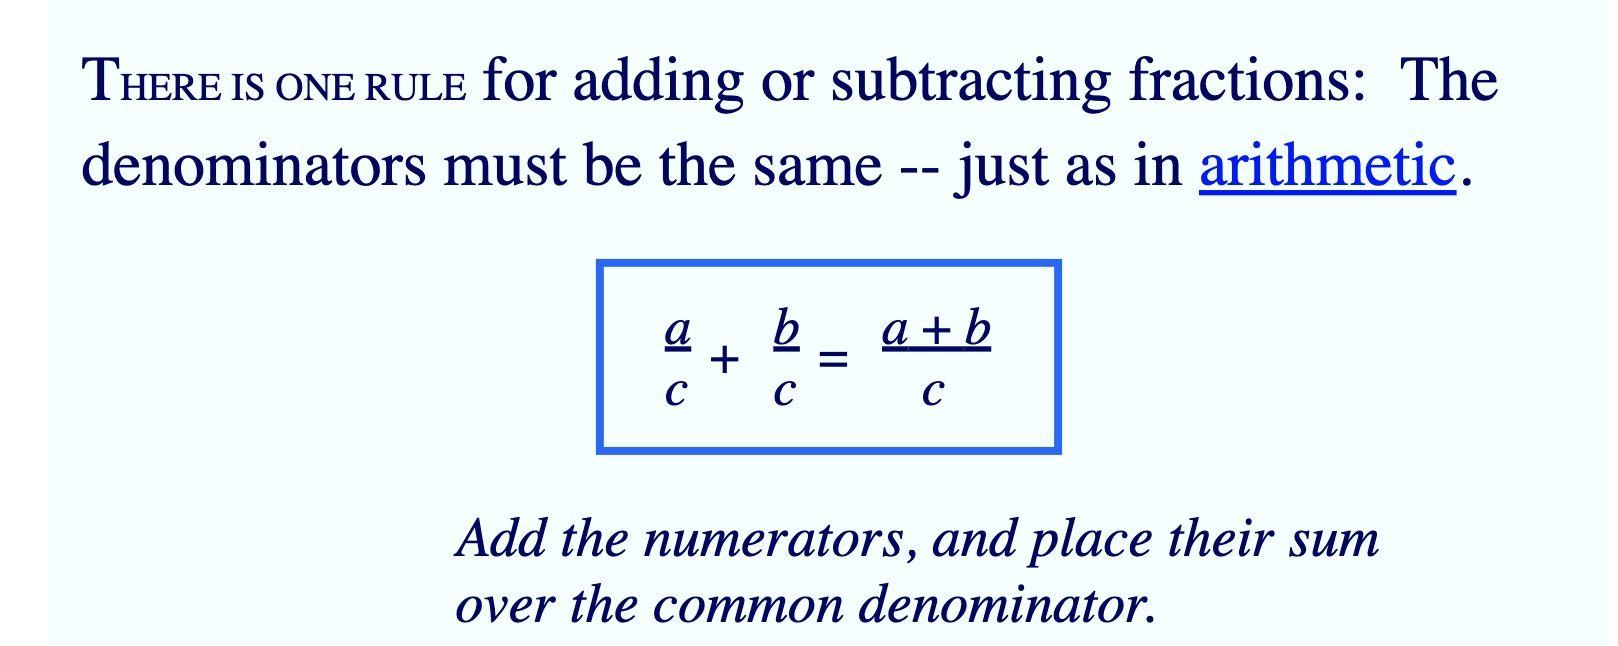 Alegbraic Fractions Subtracting Fractions Algebra Fractions Adding and subtracting radical numbers